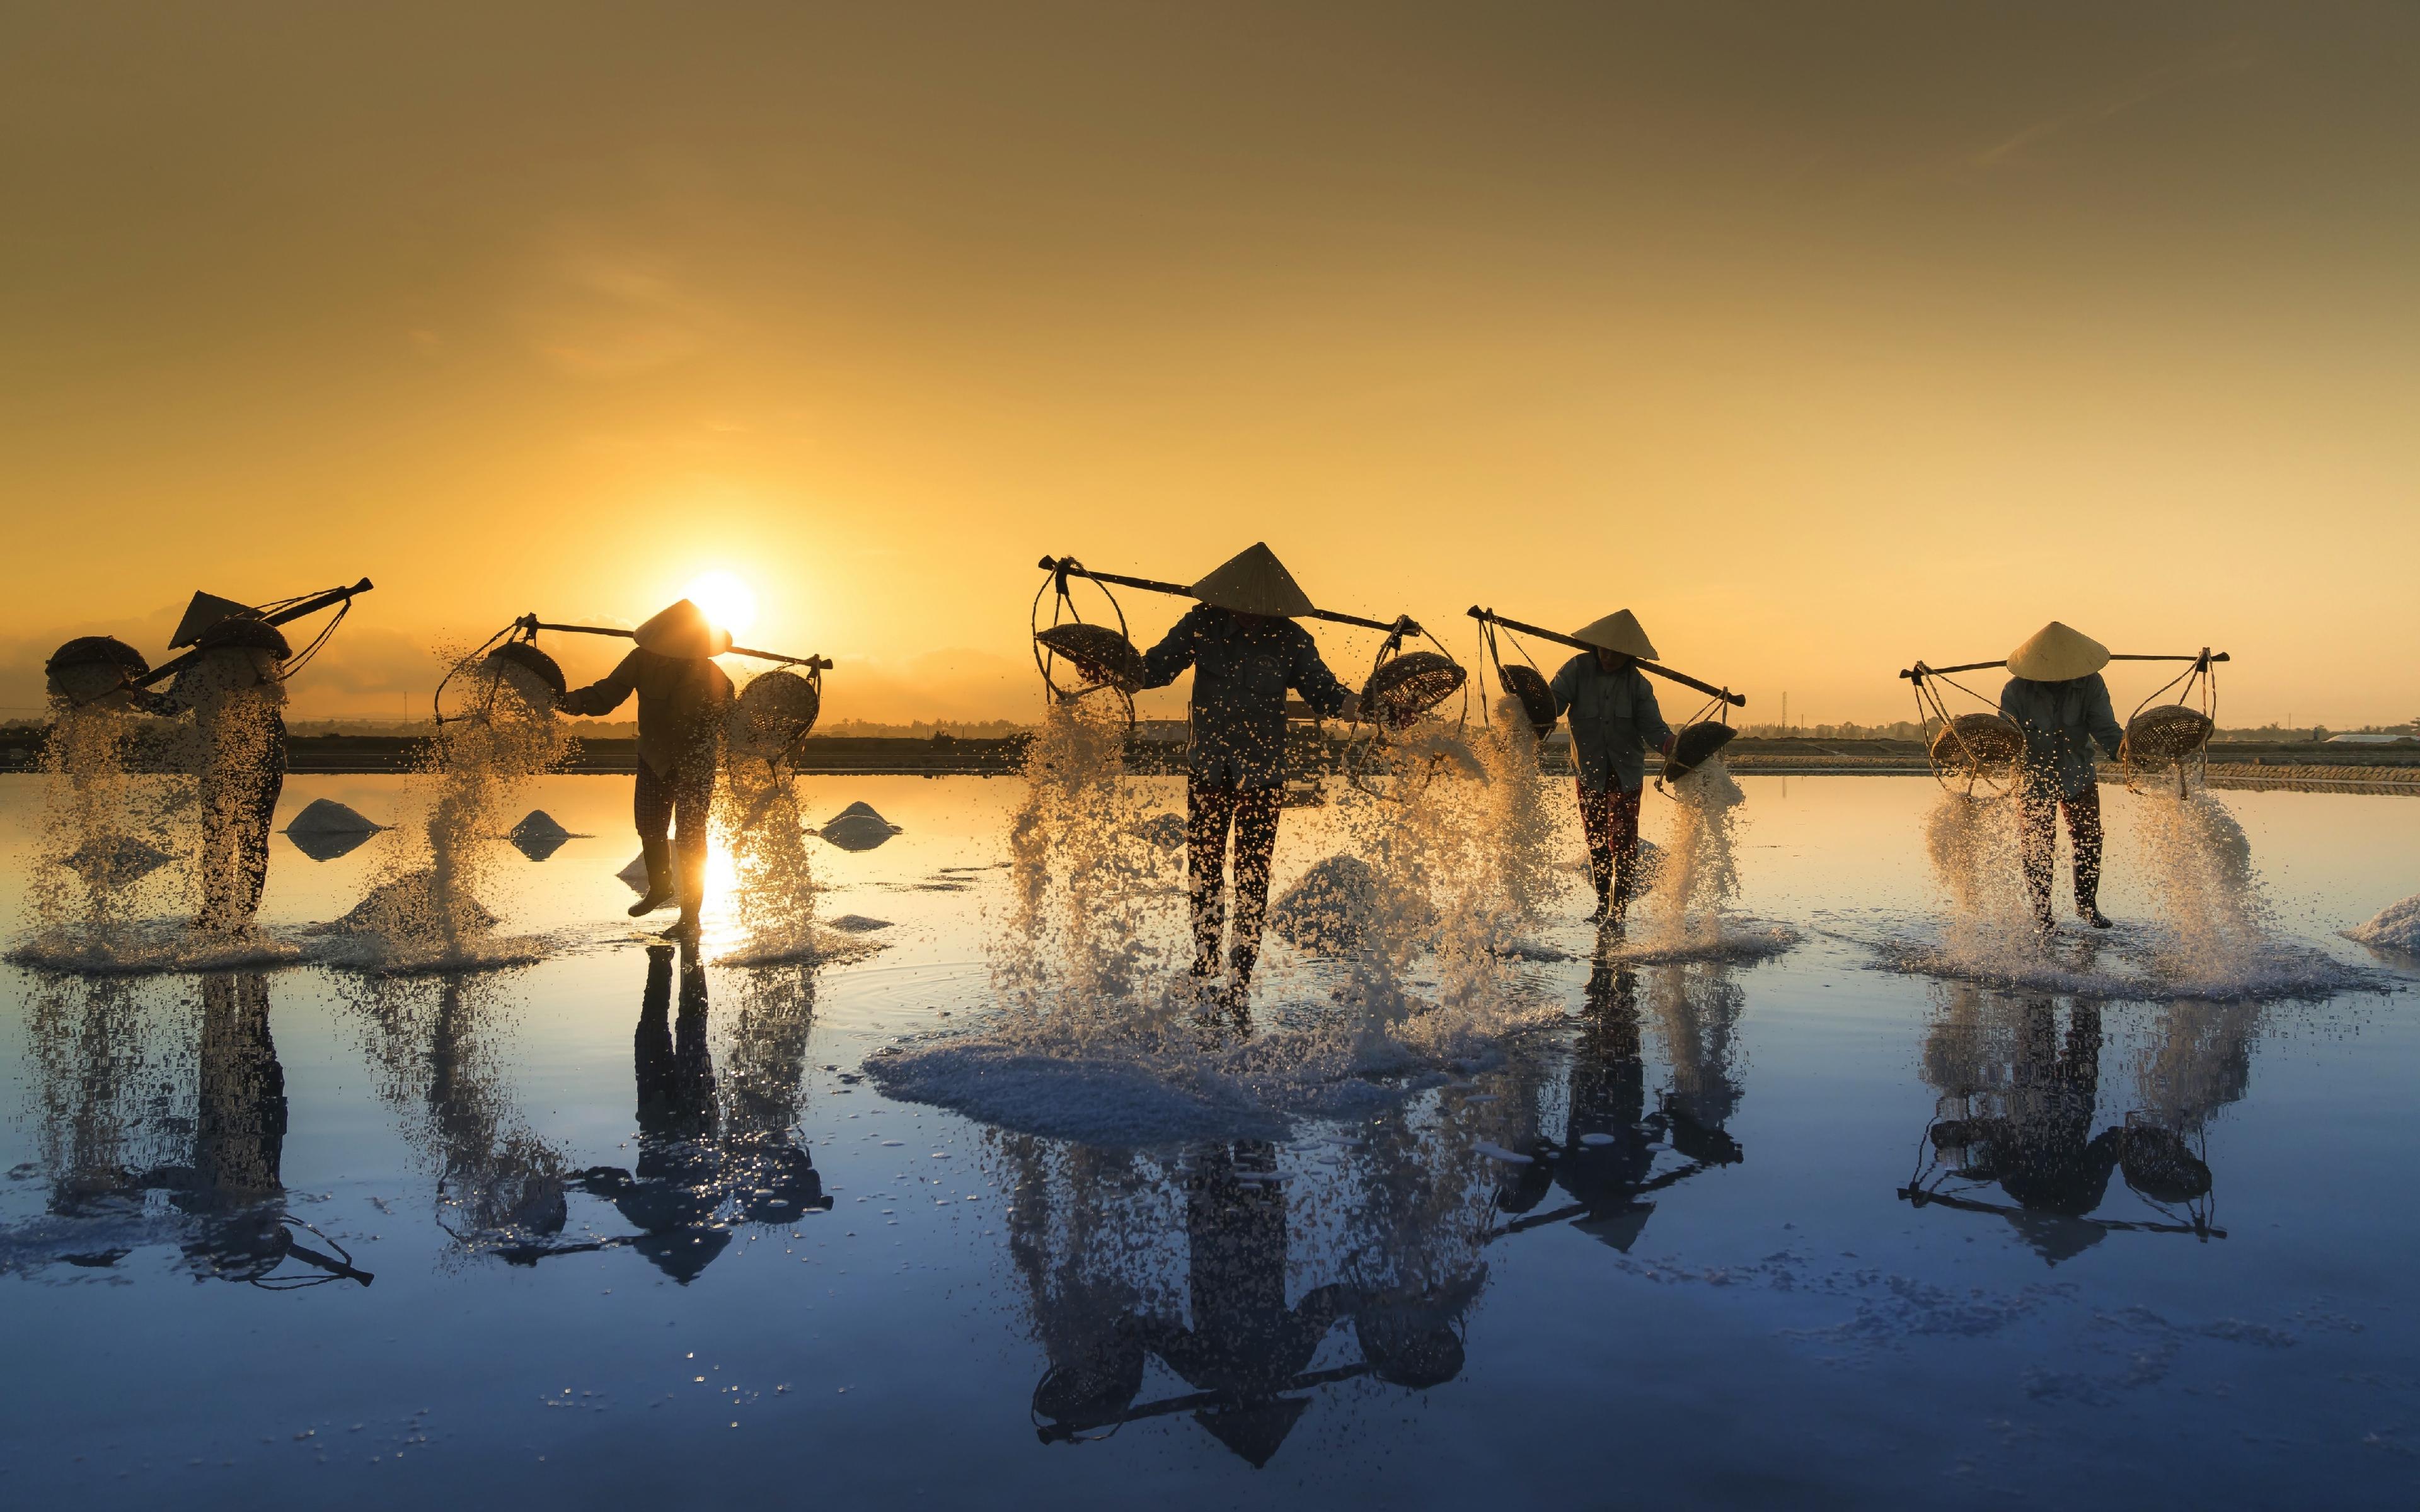 Download 3840x2400 wallpaper salt farm, landscape, reflections ...